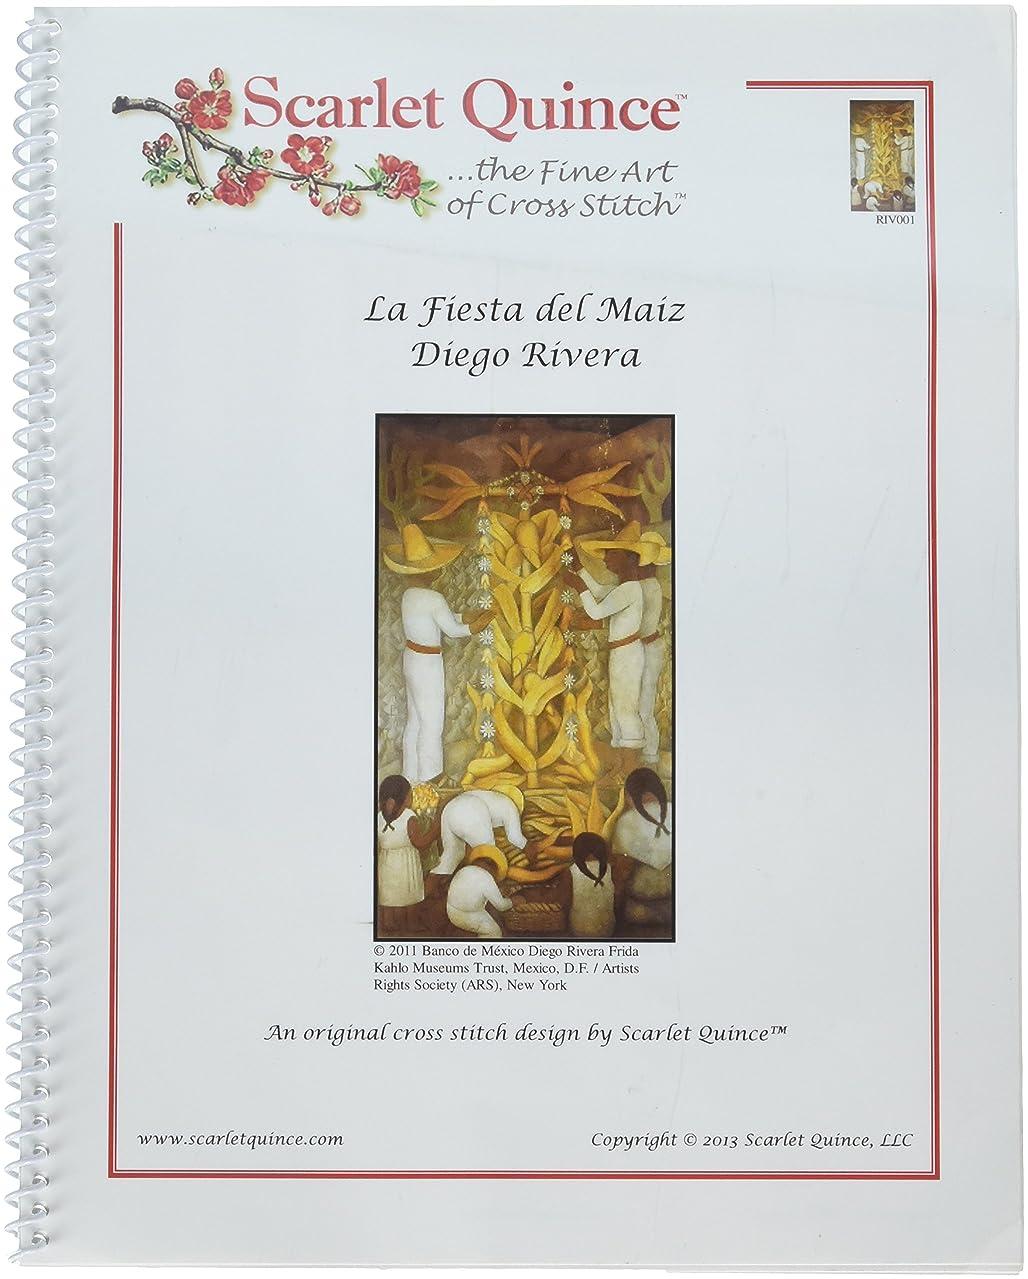 Scarlet Quince RIV001 La Fiesta del Maiz by Diego Rivera Counted Cross Stitch Chart, Regular Size Symbols